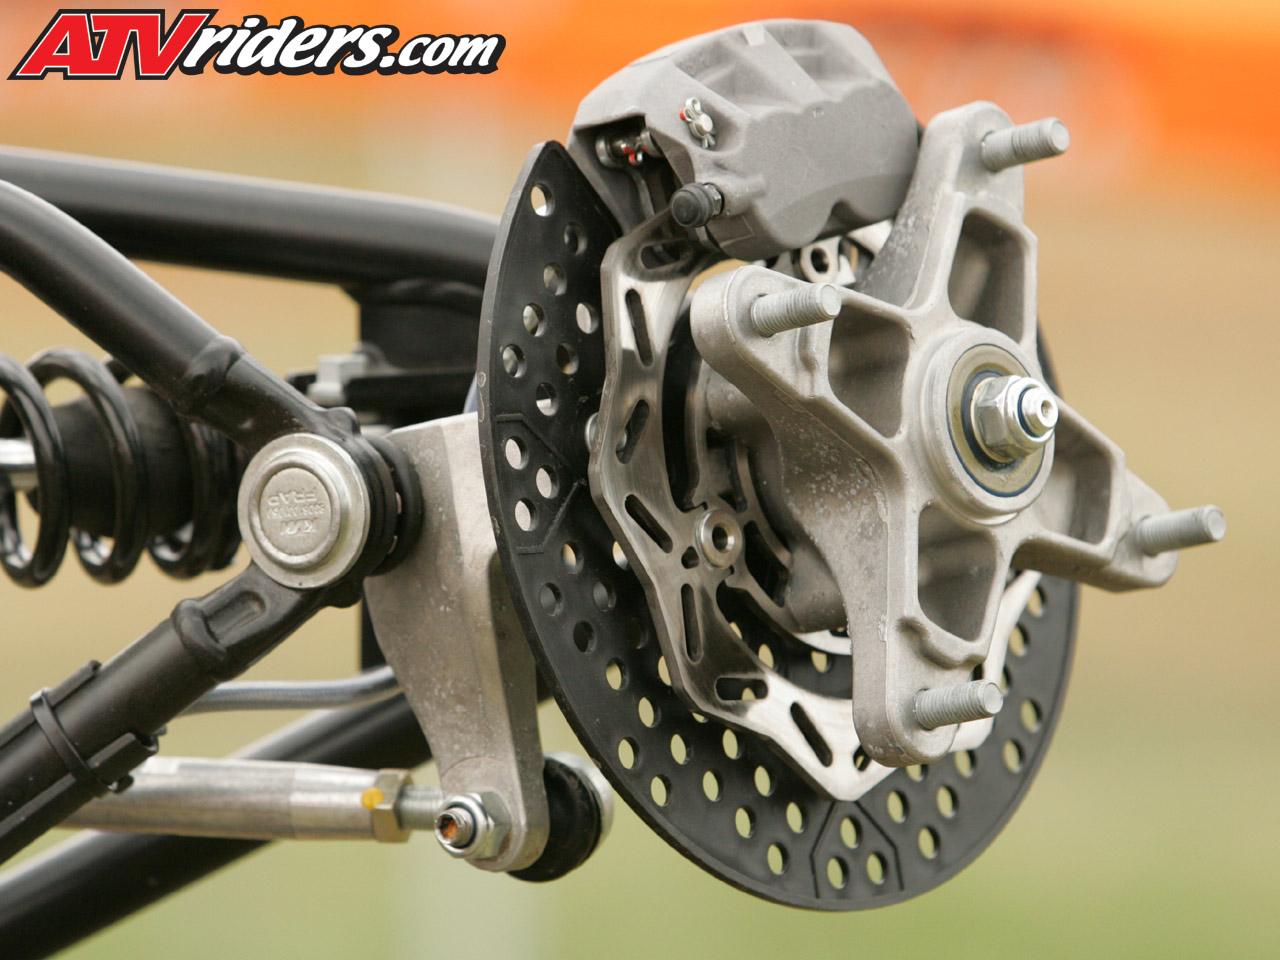 2008 ktm atv 525xc & 450xc sport atv press intro - first test ride